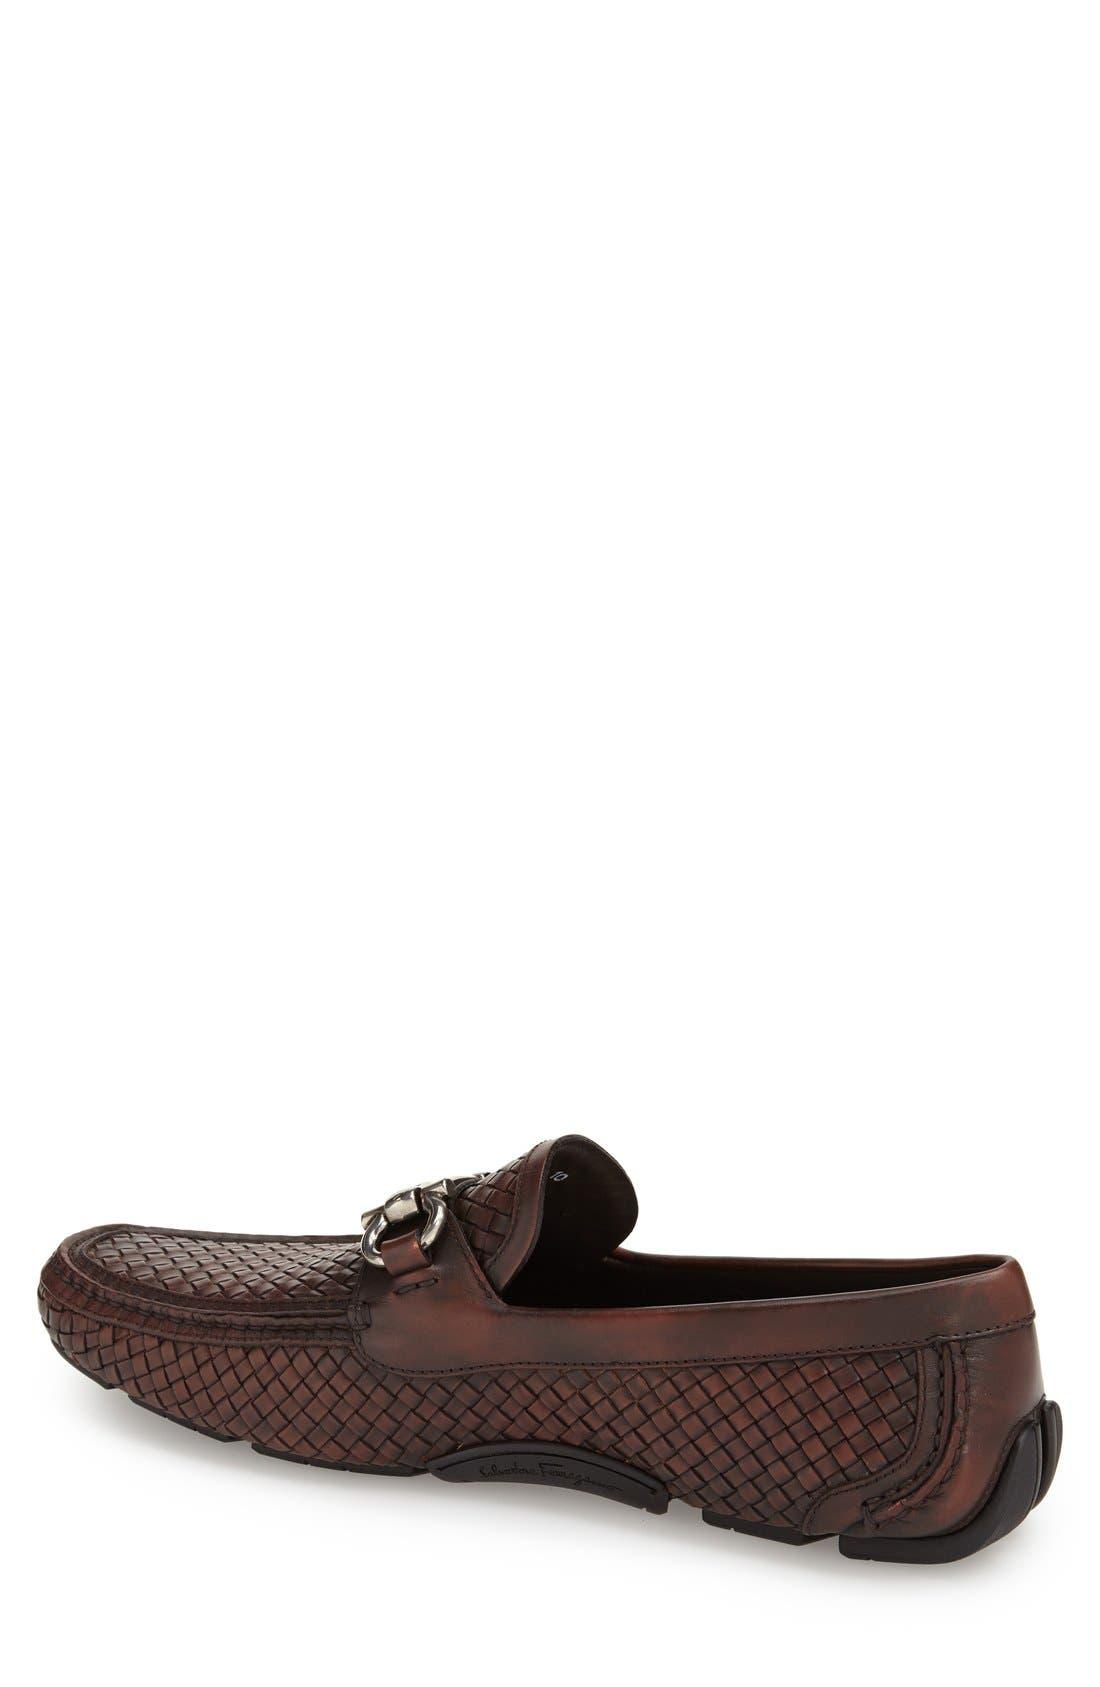 'Parigi' Woven Bit Loafer,                             Alternate thumbnail 2, color,                             Brown Hen/ T Moro Leather